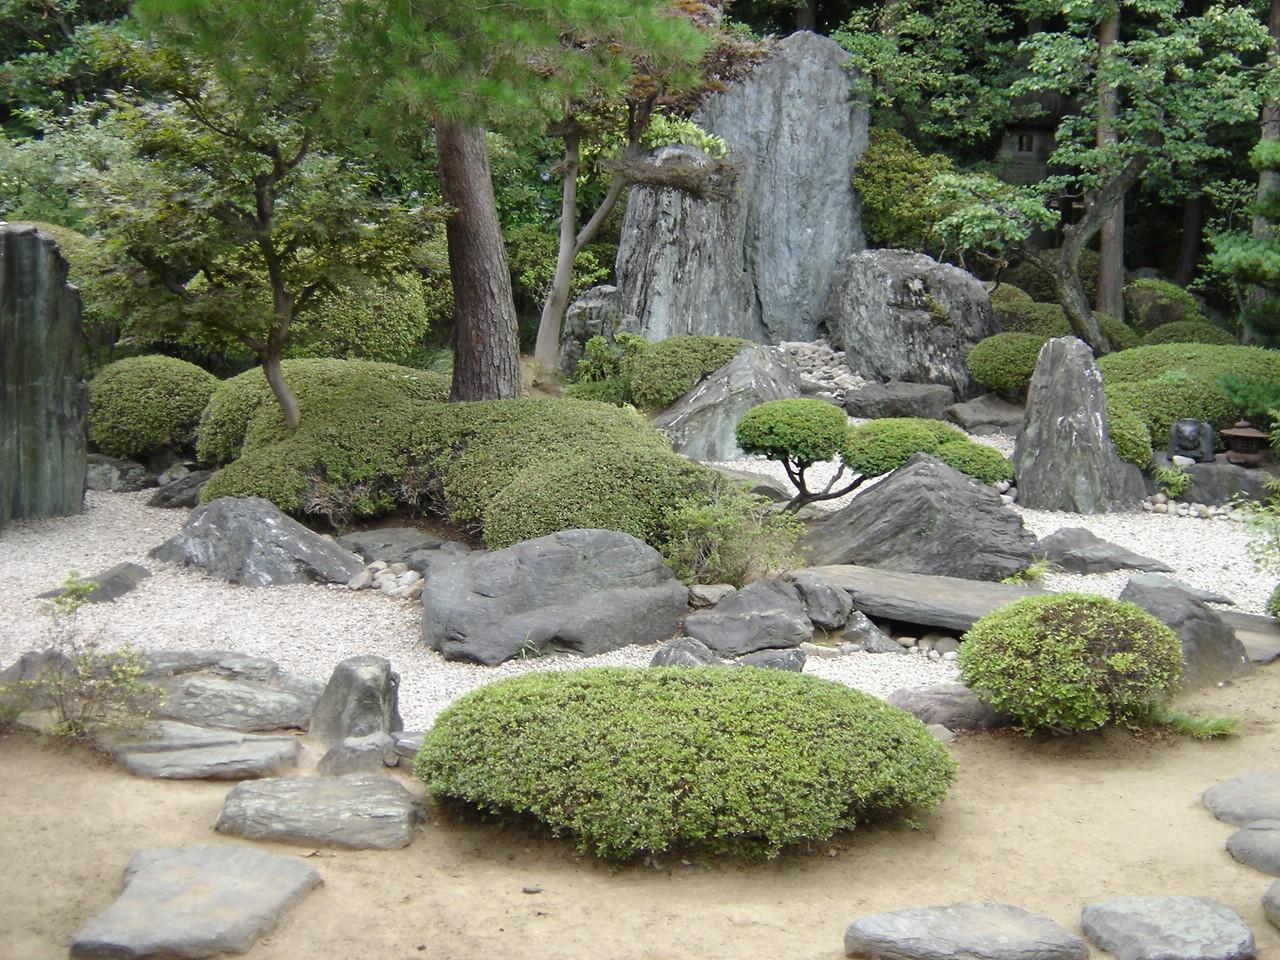 Jardin Japonais Minecraft Nouveau Image Idee Deco Jardin Japonais